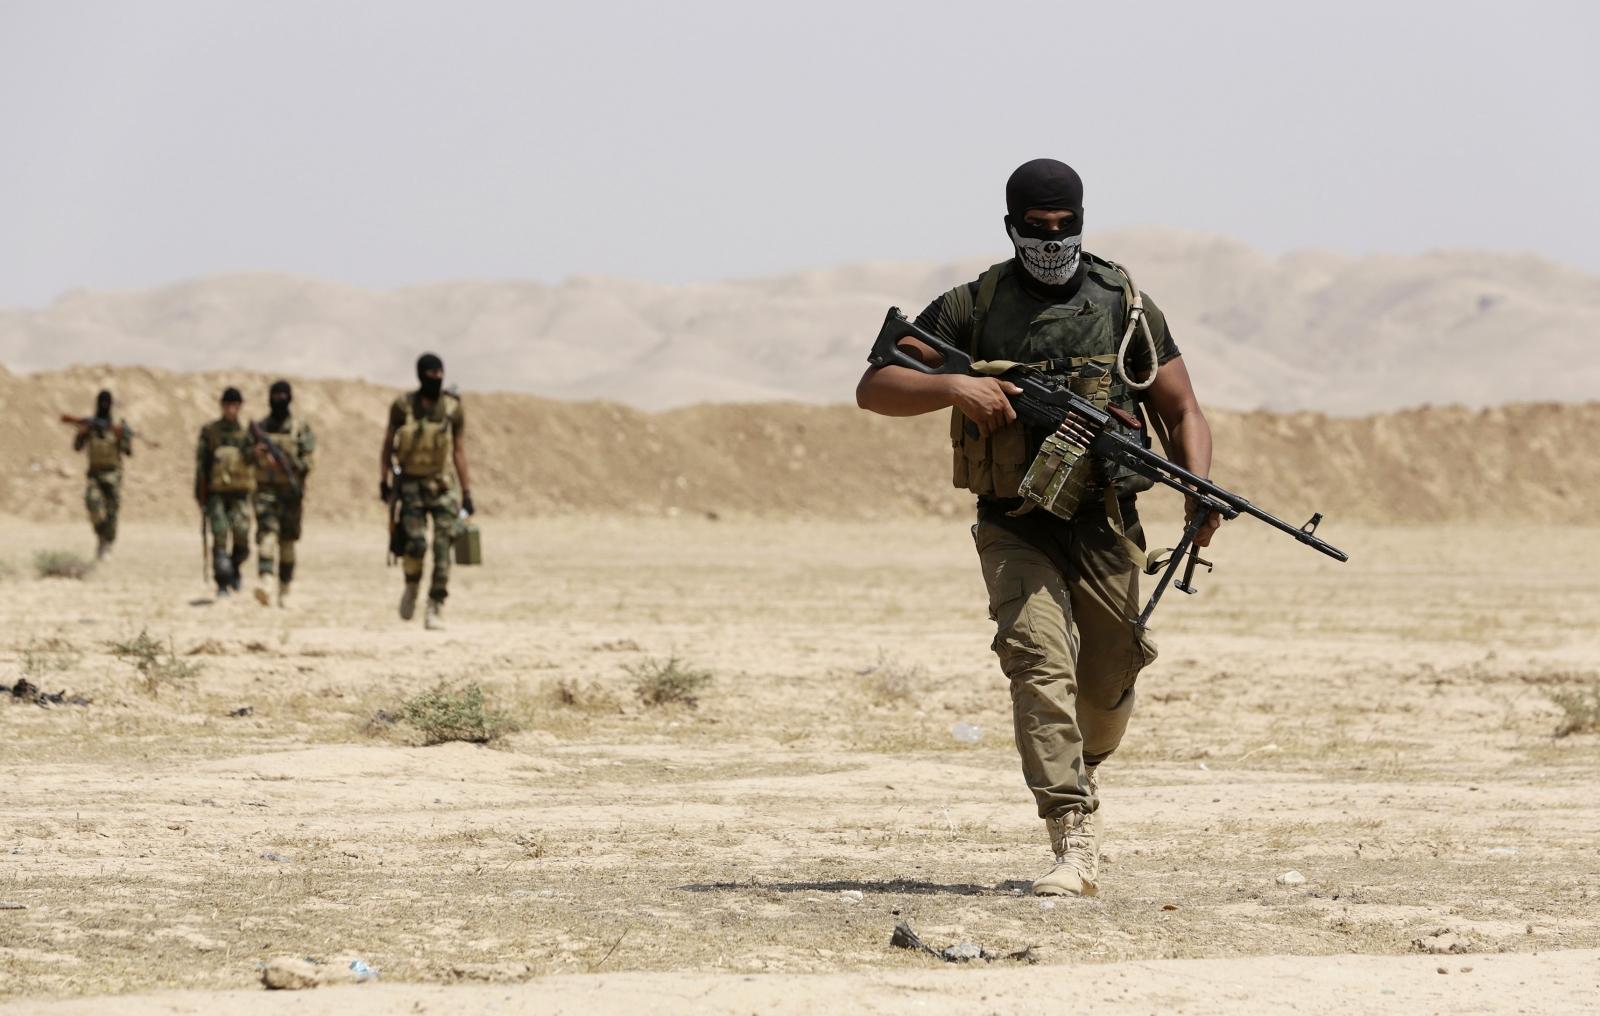 Studying Iraqi Kurdistan Regional Guard Forces (Peshmerga)